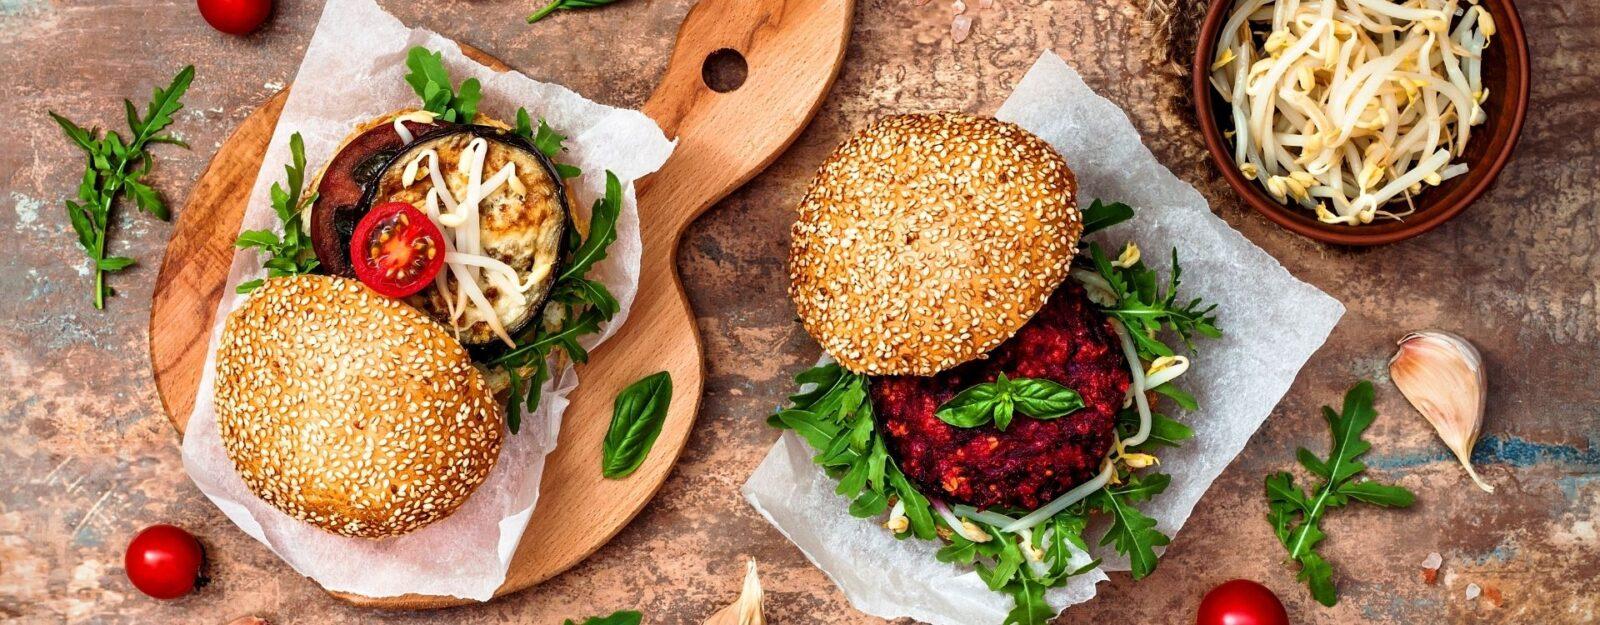 <small><small>майстер-клас </small></small><br> Вегетаріанської кухні